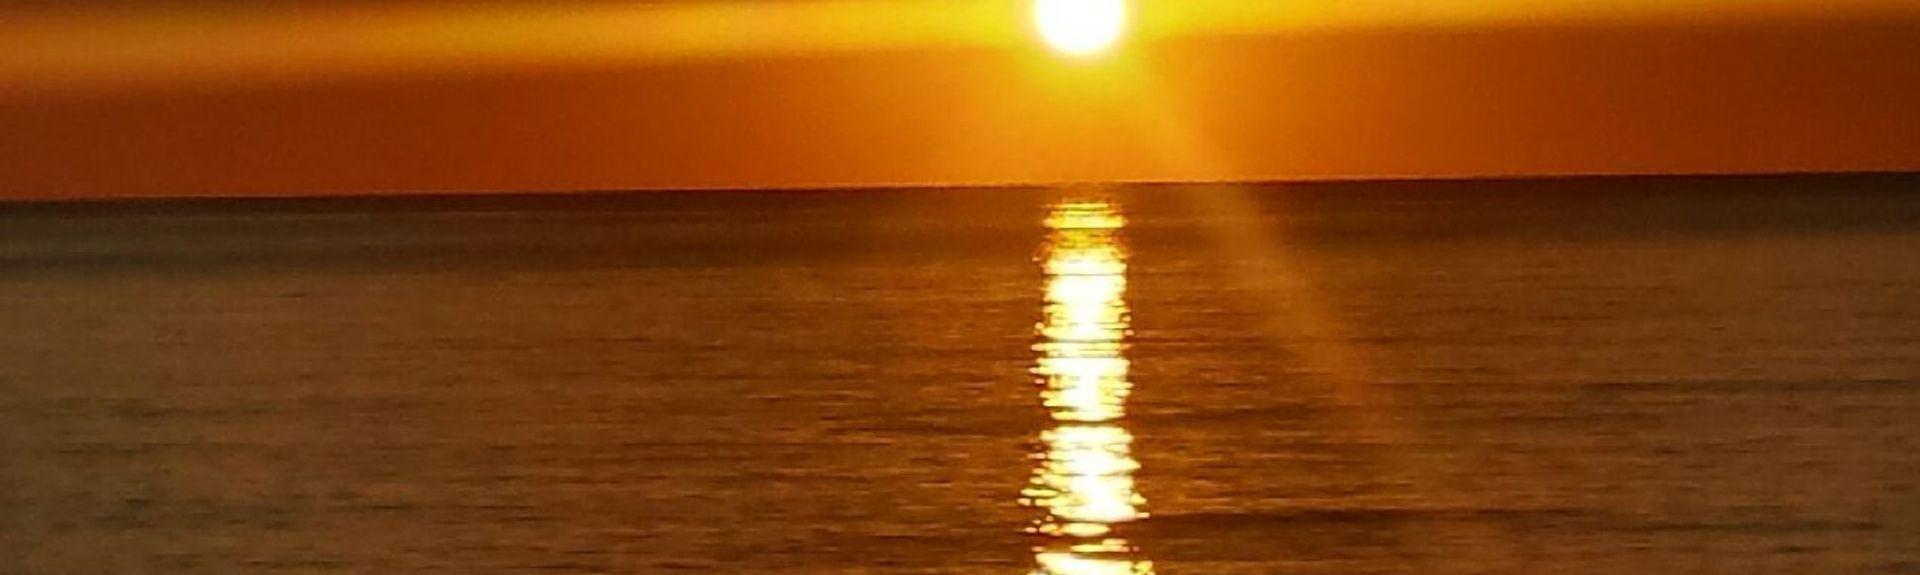 Porto Corallo Beach, Villaputzu, Sardinia, Italy